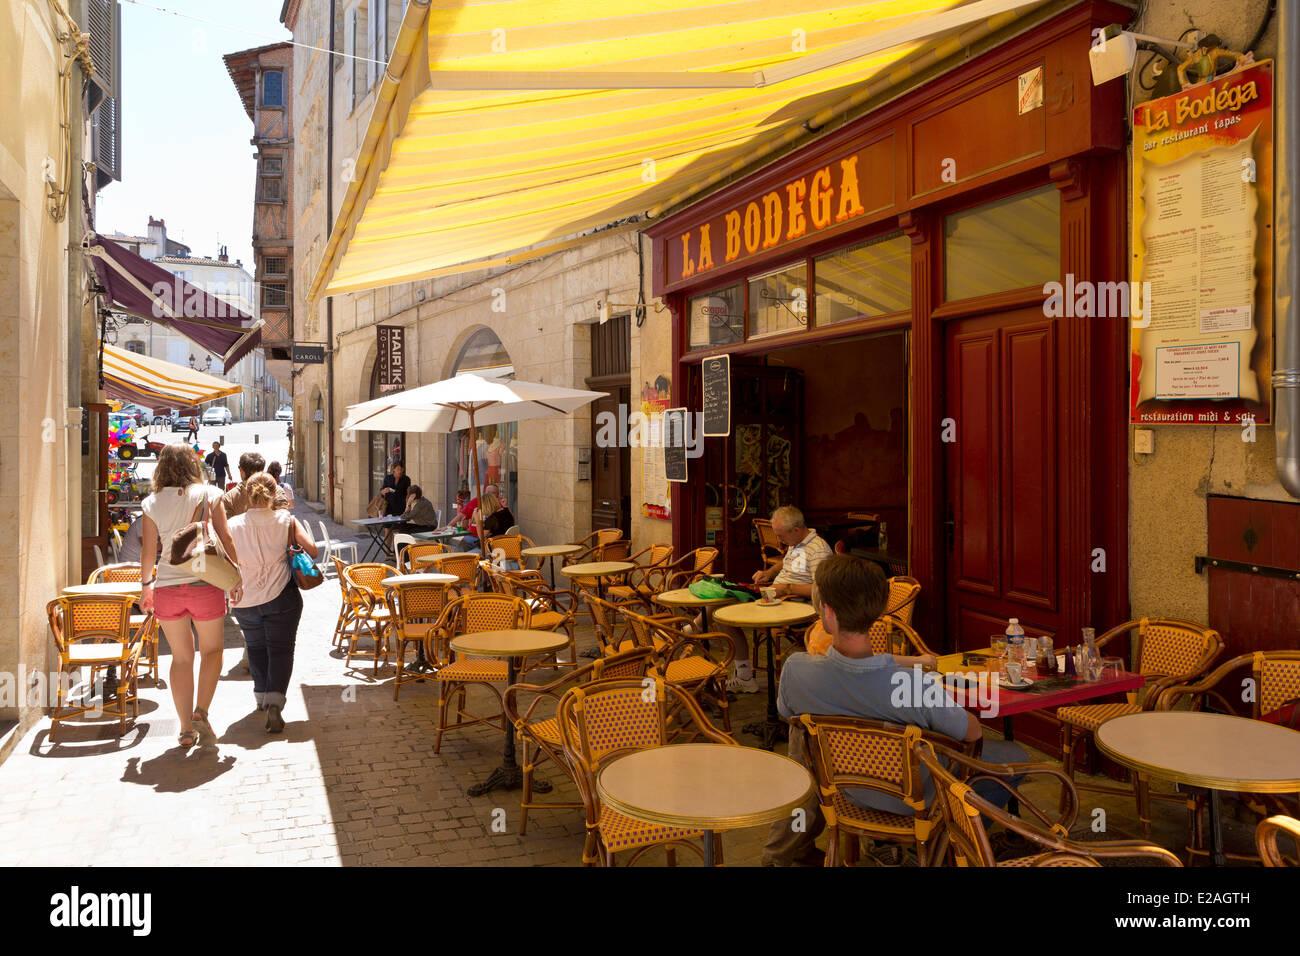 France, Gers, Auch, stop on El Camino de Santiago, cafe terrace - Stock Image